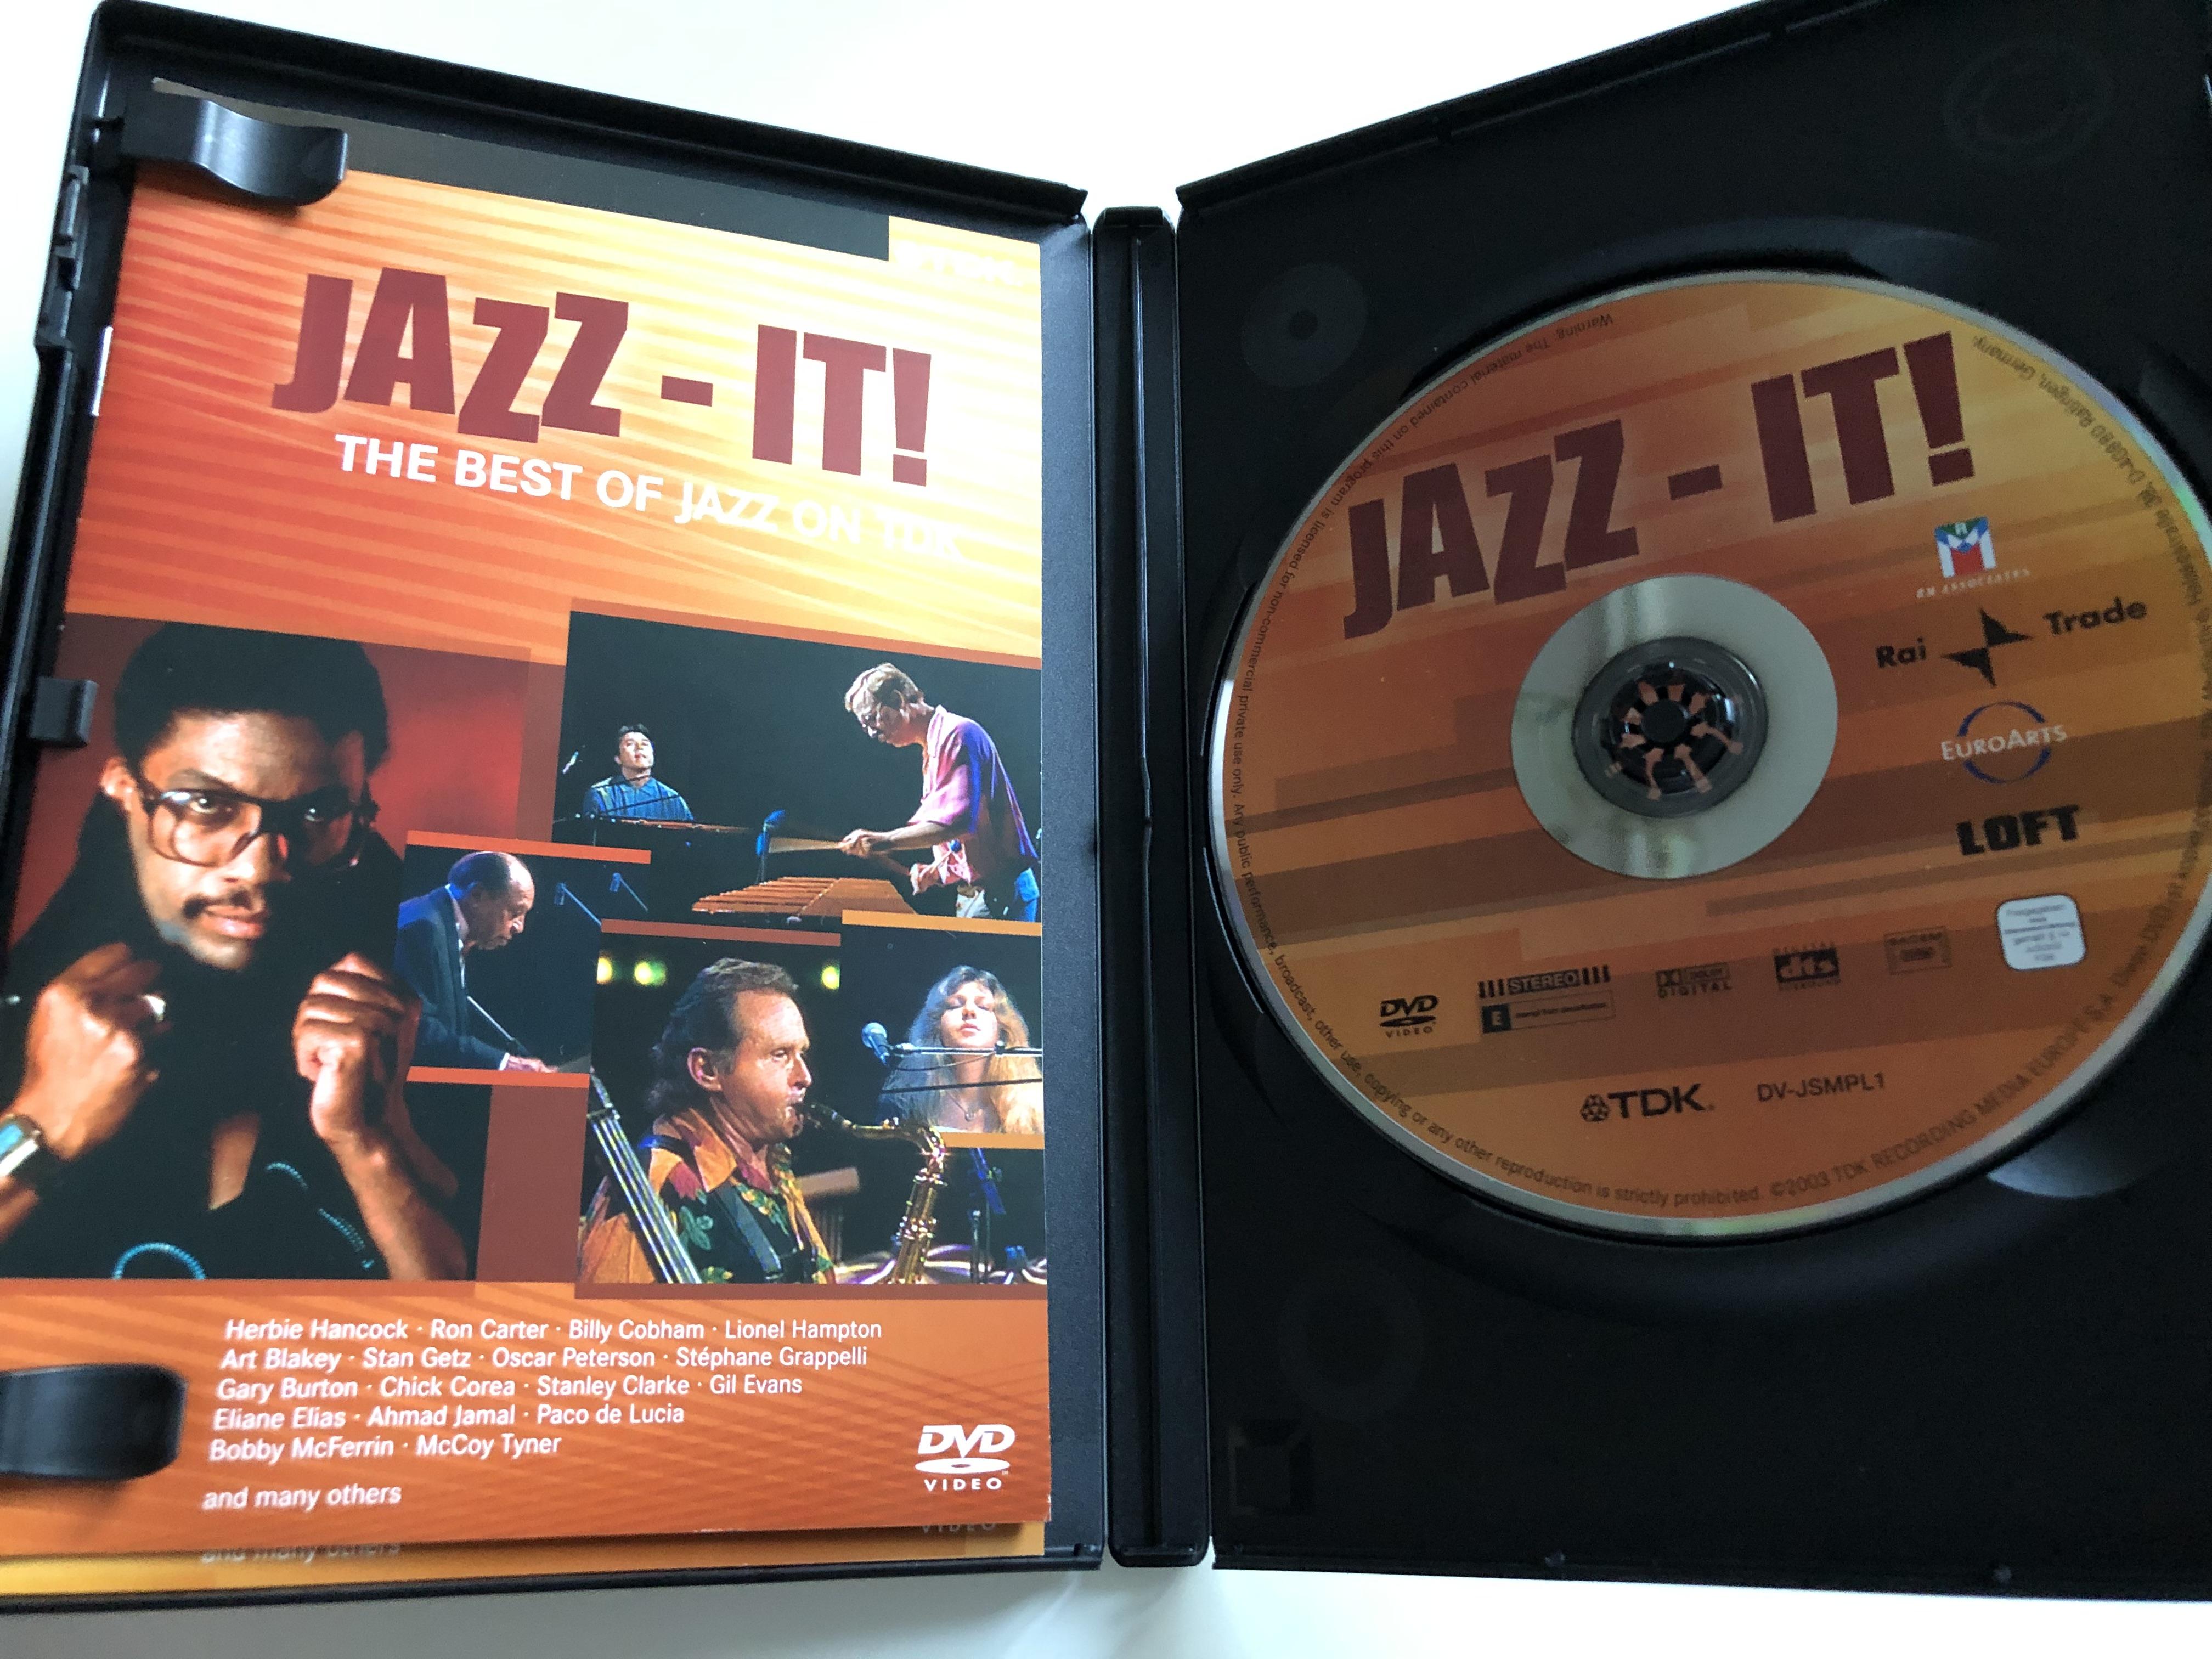 jazz-it-dvd-2003-the-best-of-jazz-on-tdk-herbie-hancock-ron-carter-stan-getz-oscar-peterson-gil-evans-mccoy-tyner-dv-jsmpl1-2-.jpg